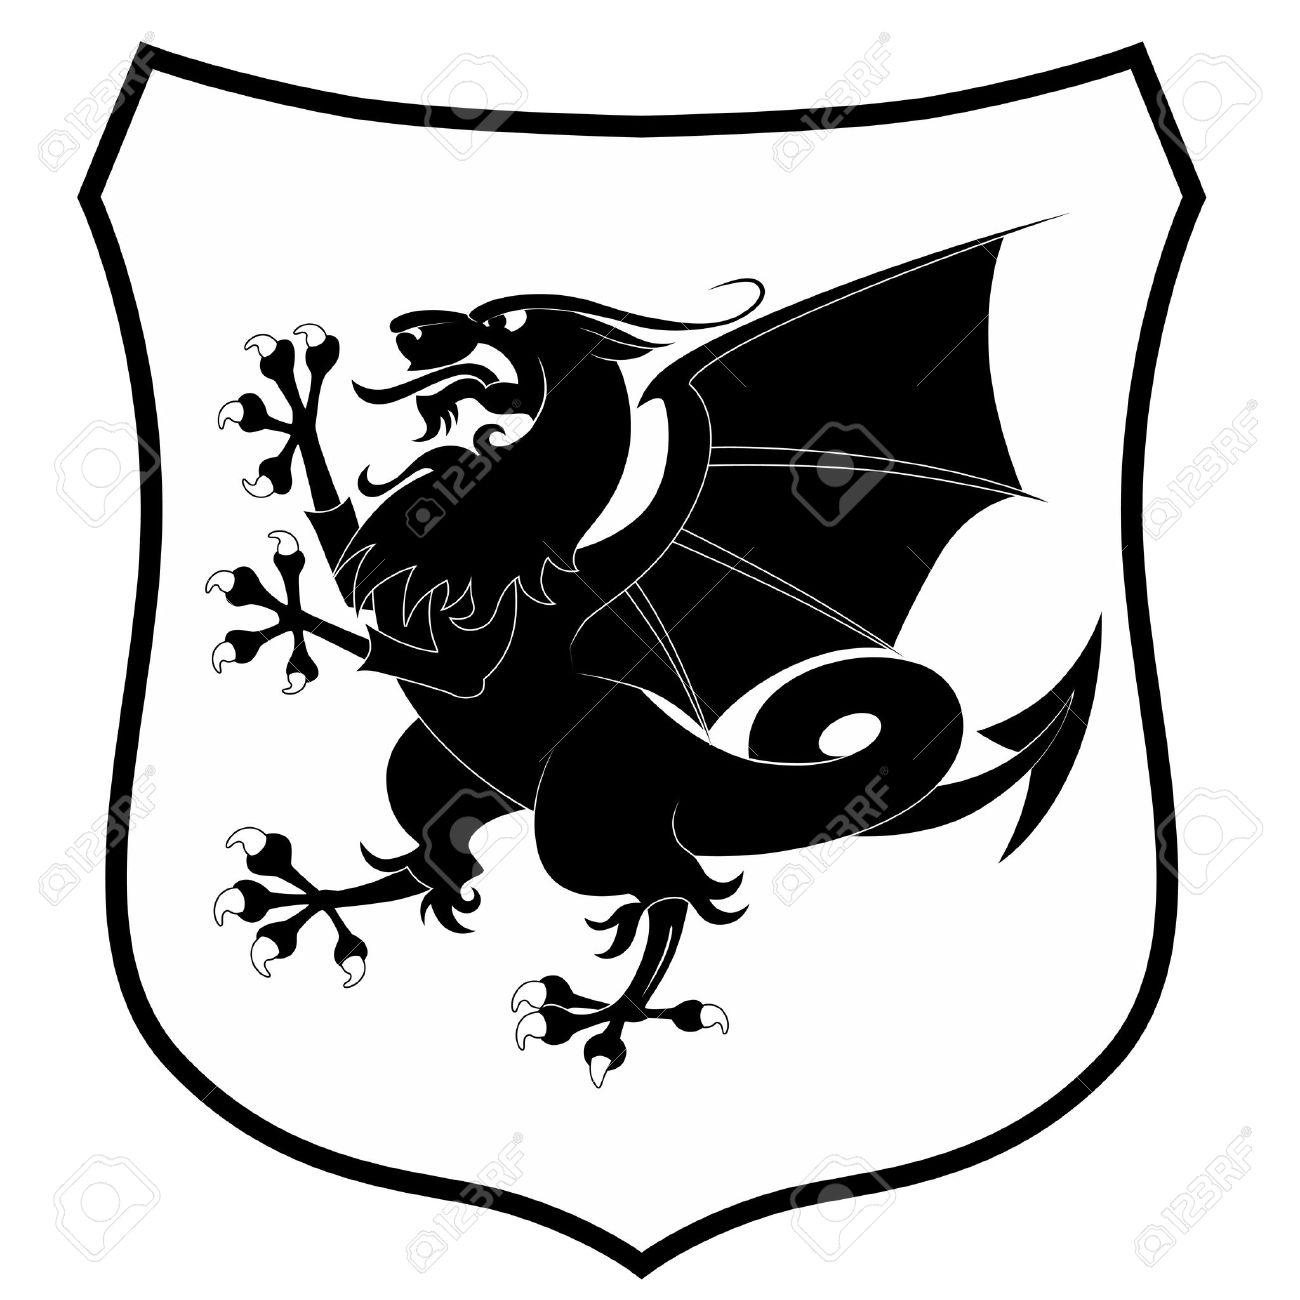 How to breed heraldic dragon - Heraldic Design Elements Heraldic Dragon Isolated On White Background